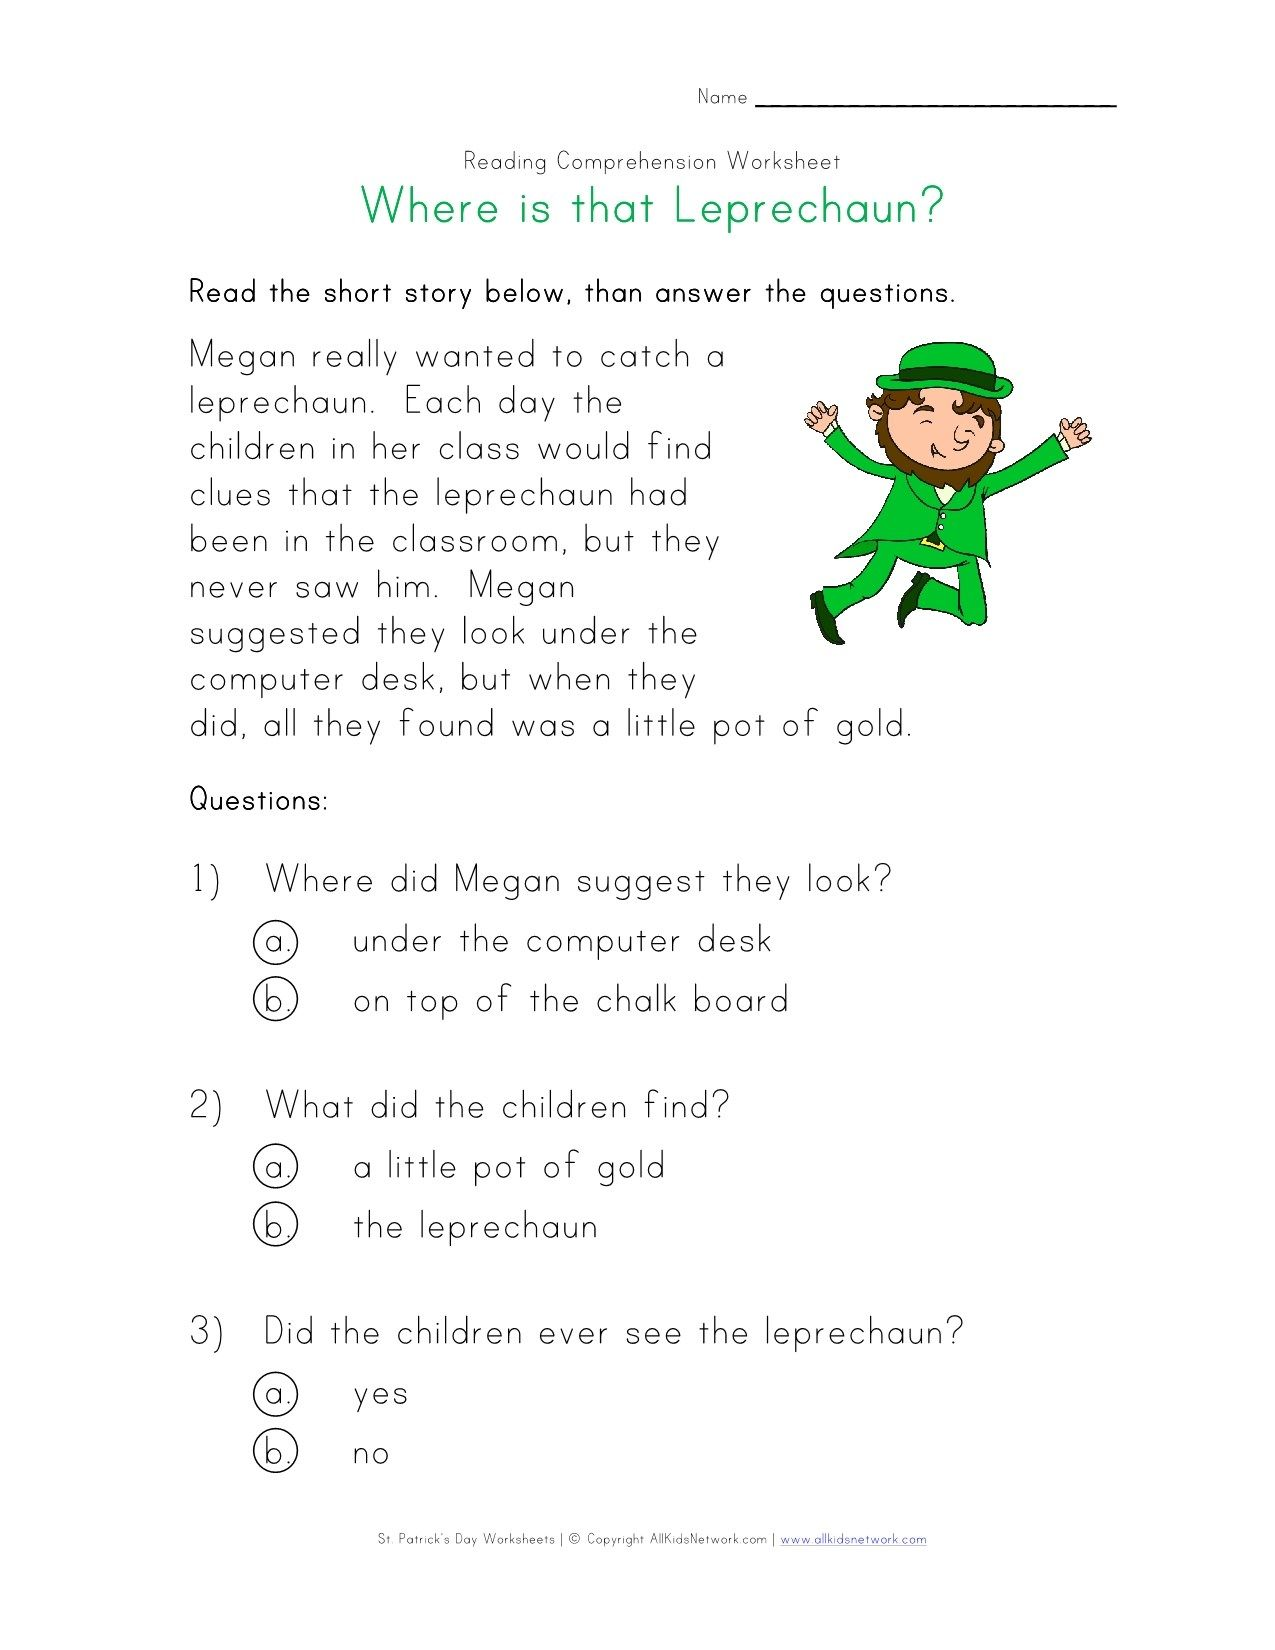 Leprechaun Reading Comprehension Worksheet